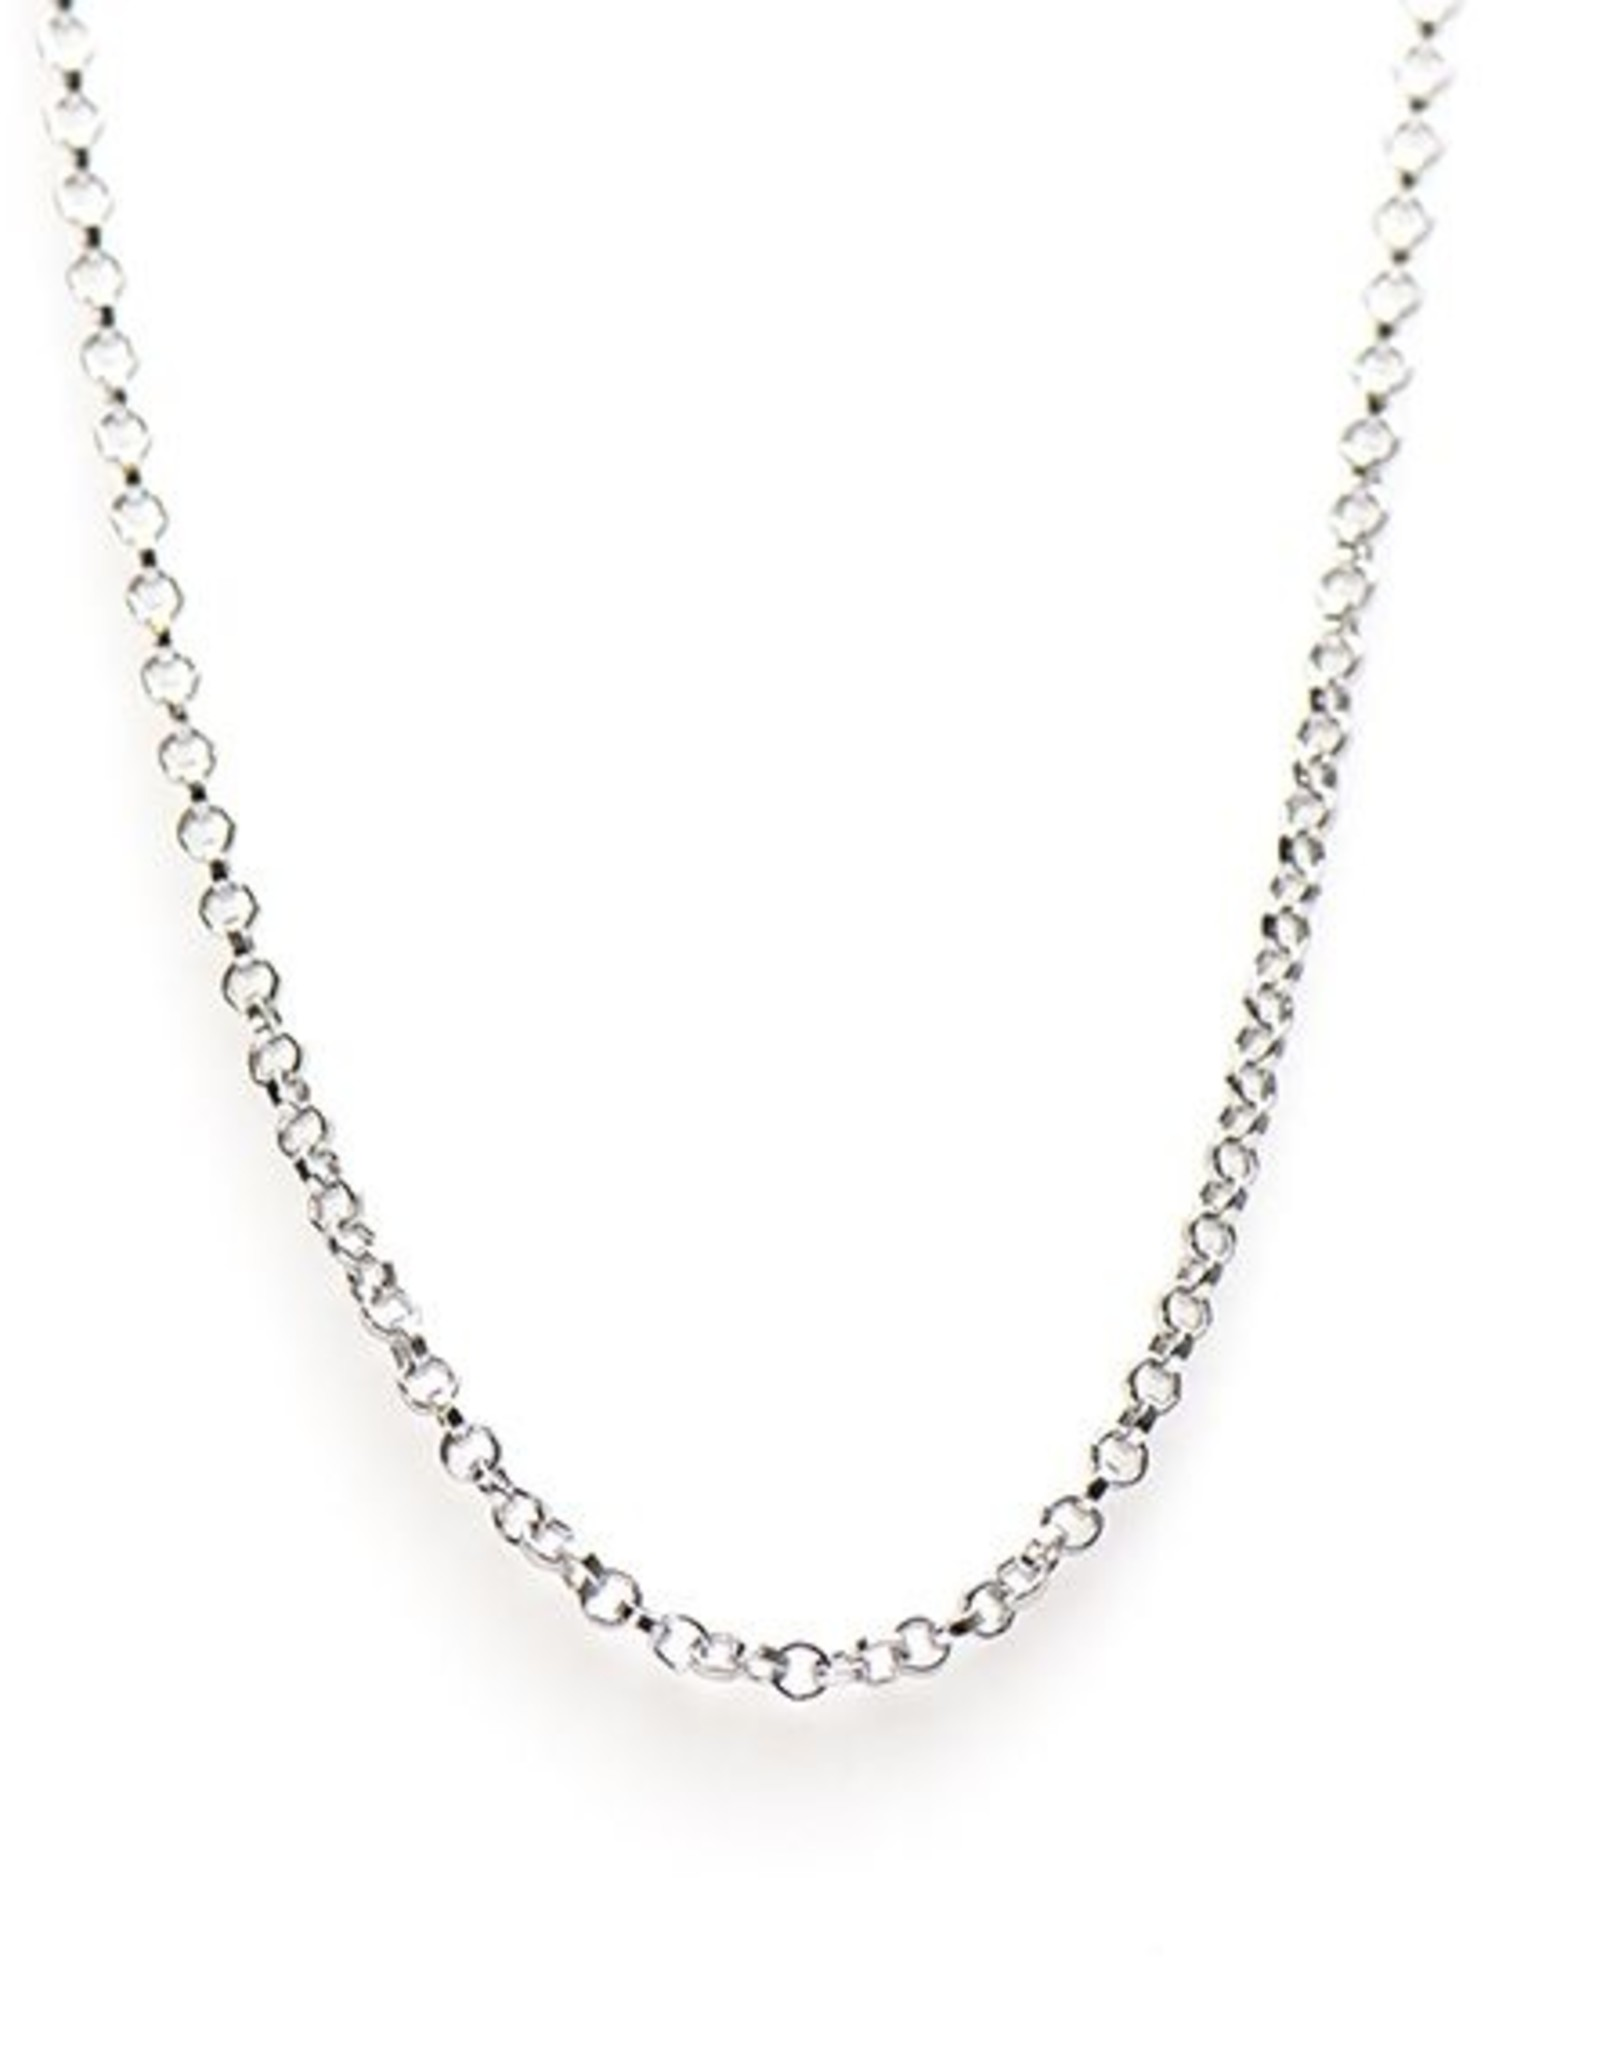 Karma Necklace Round Chain Silver